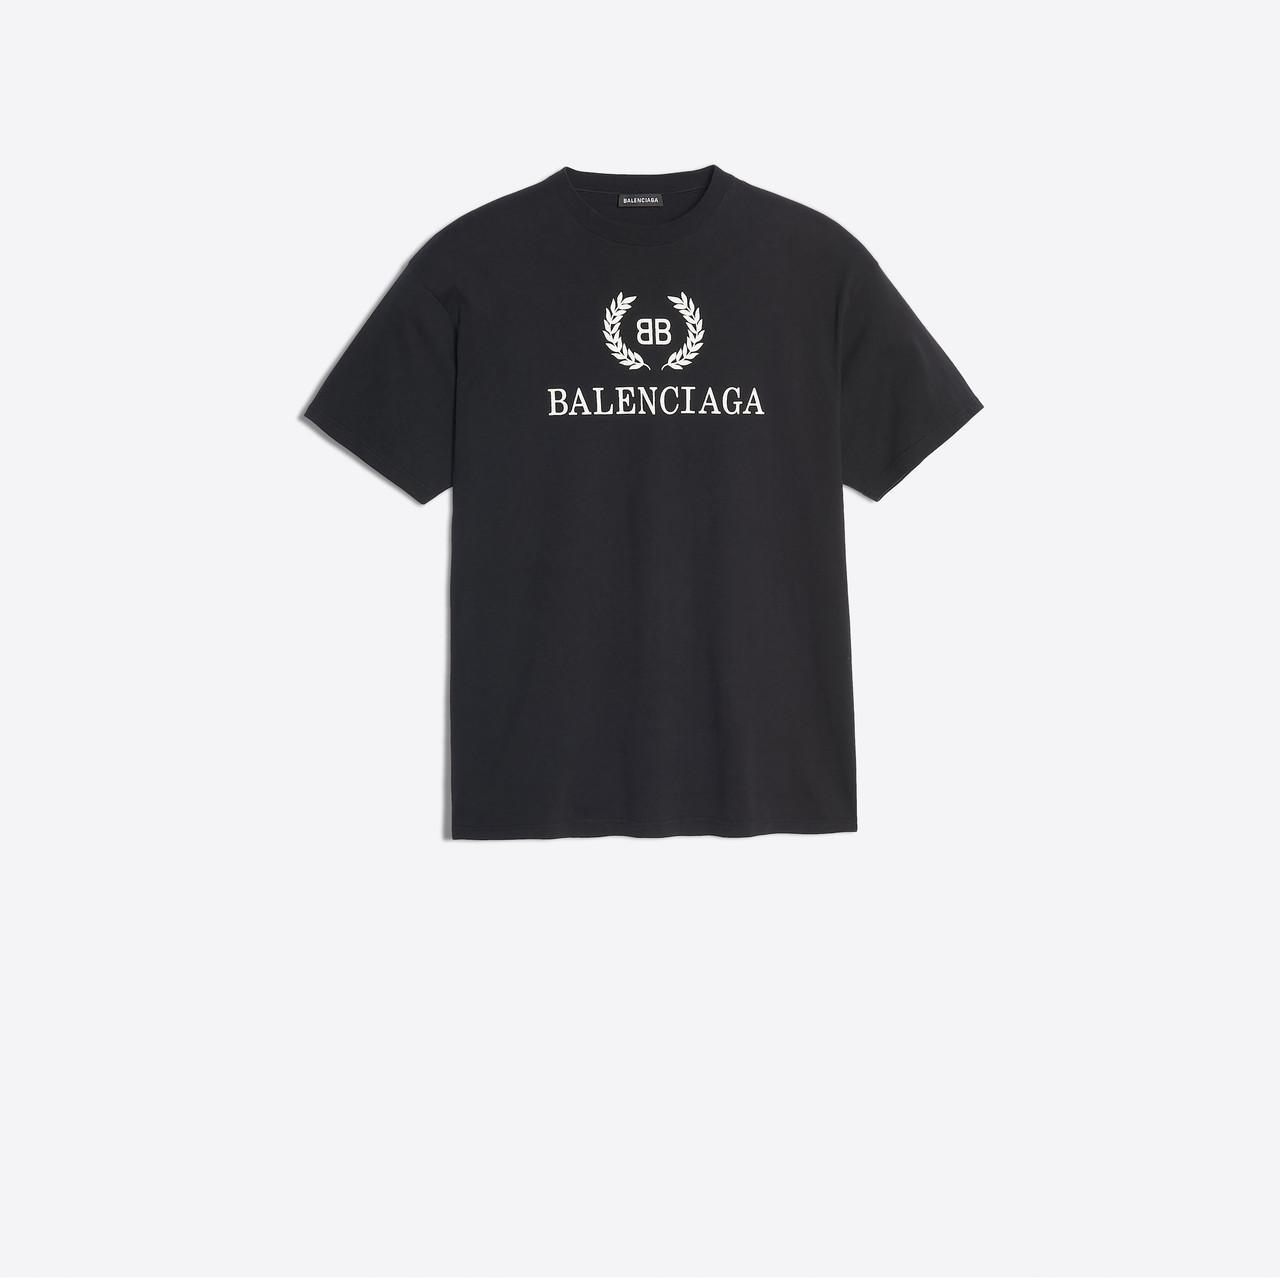 89b20bea9768 Balenciaga - Black Bb T-shirt for Men - Lyst. View fullscreen